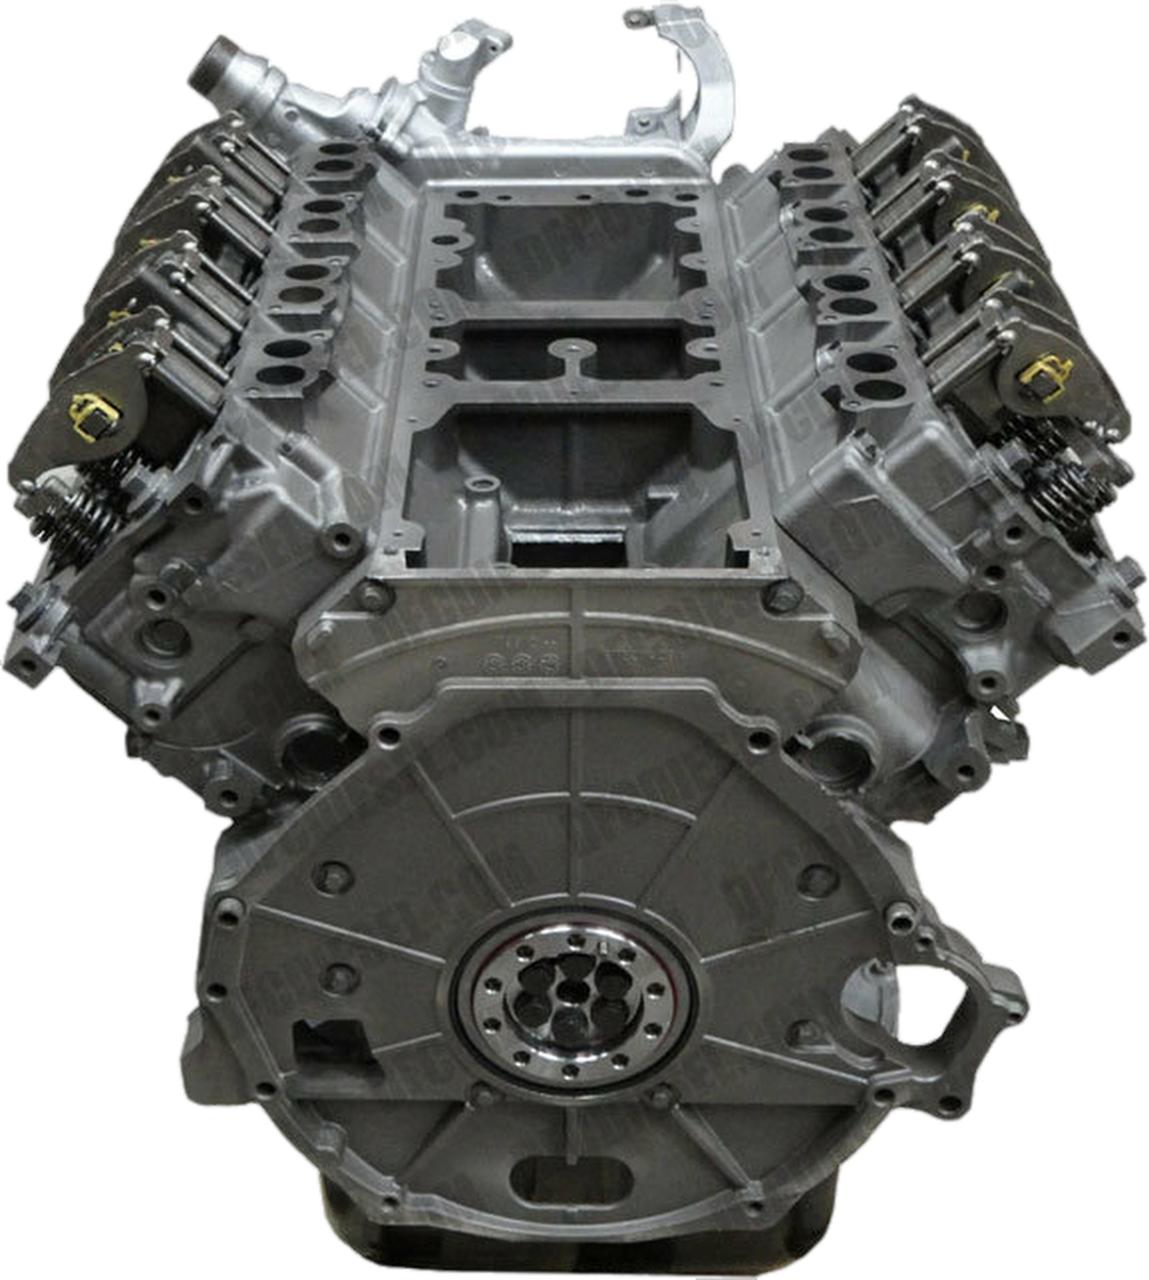 DFC Diesel- Remanufactured Long Block Ford 6.4 Powerstroke Diesel Engine